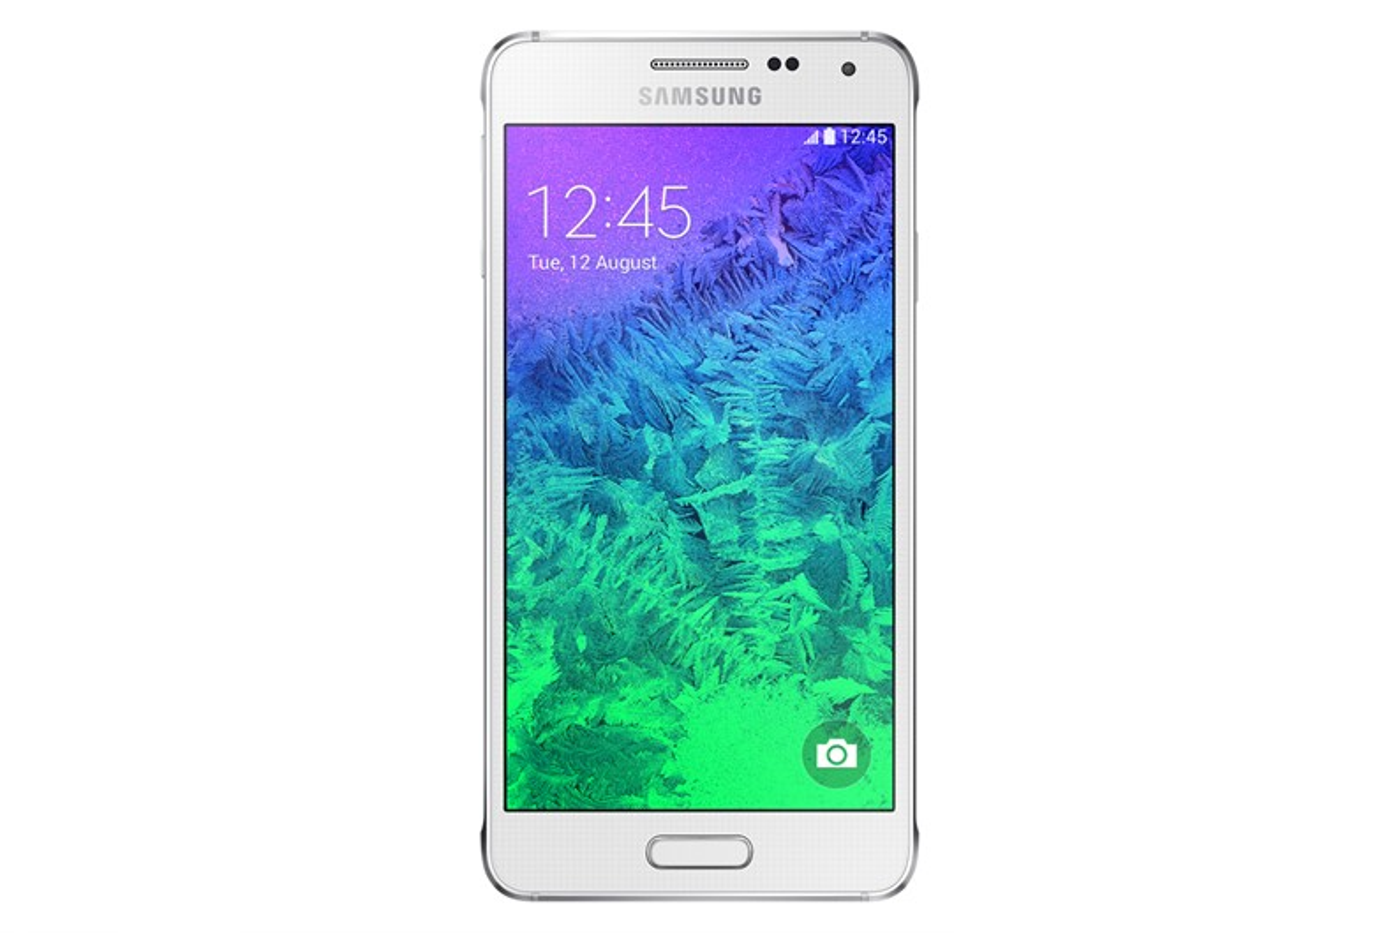 Samsung anuncia oficialmente o lançamento do Galaxy Alpha [vídeo]